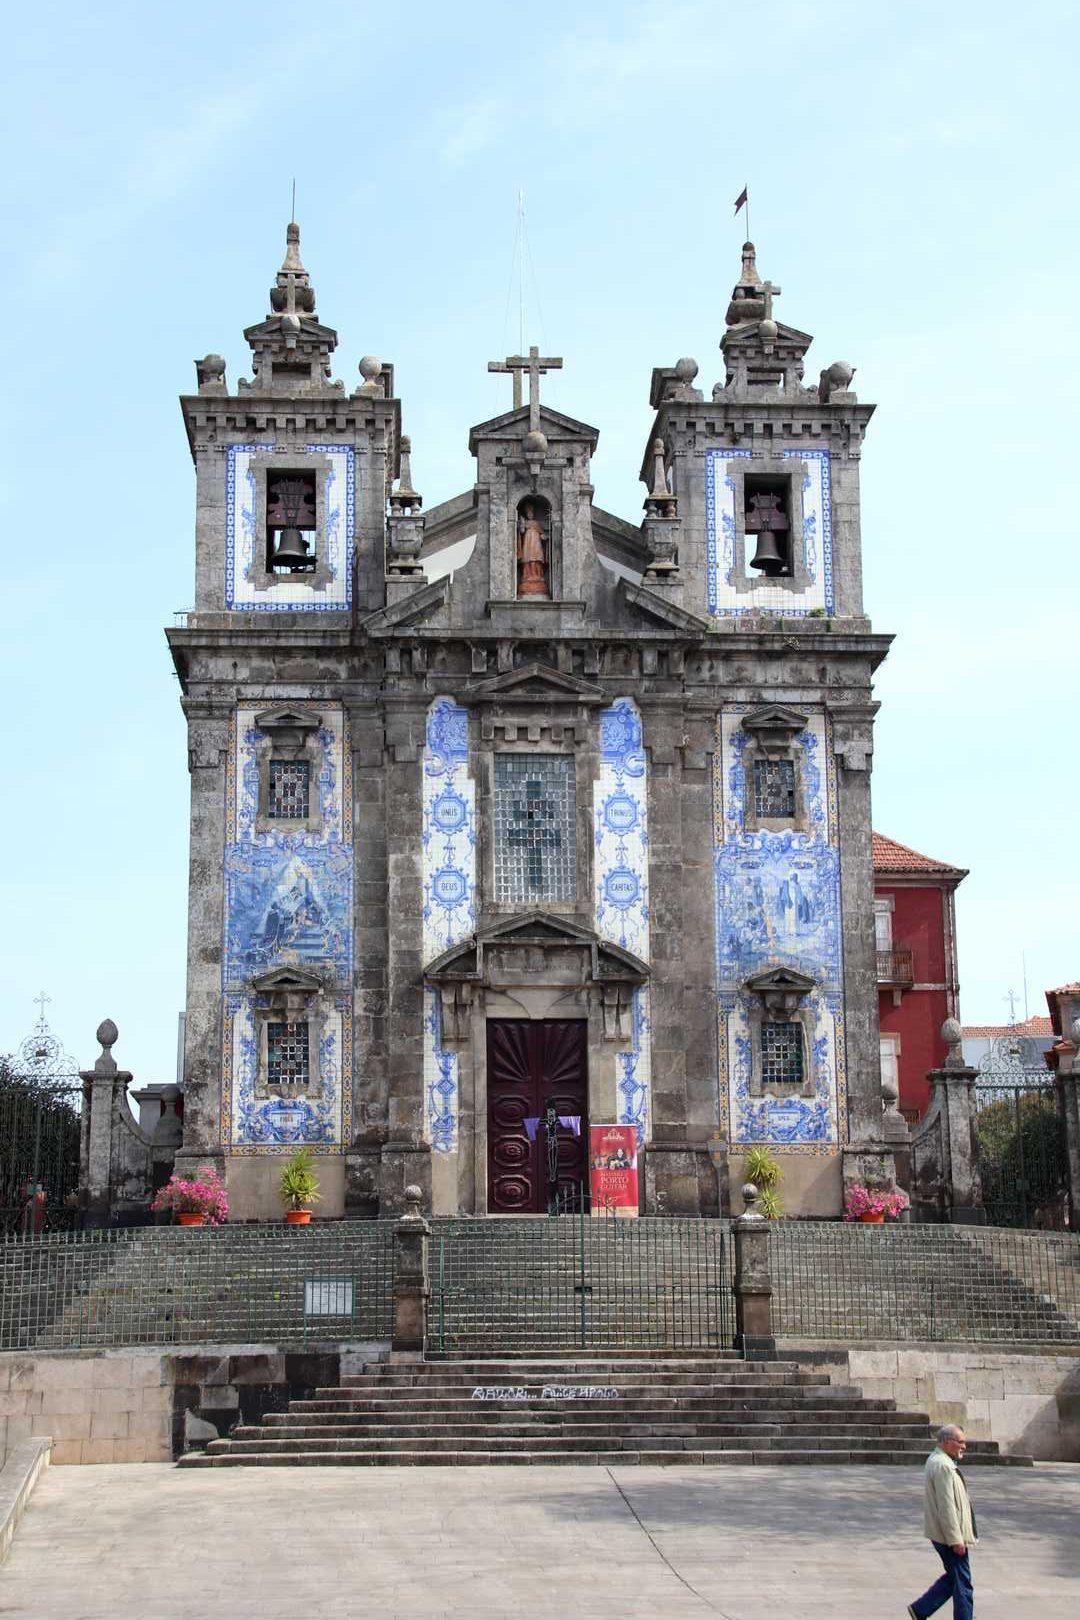 Portugal - Eglise recouverte d'azulejos à Porto